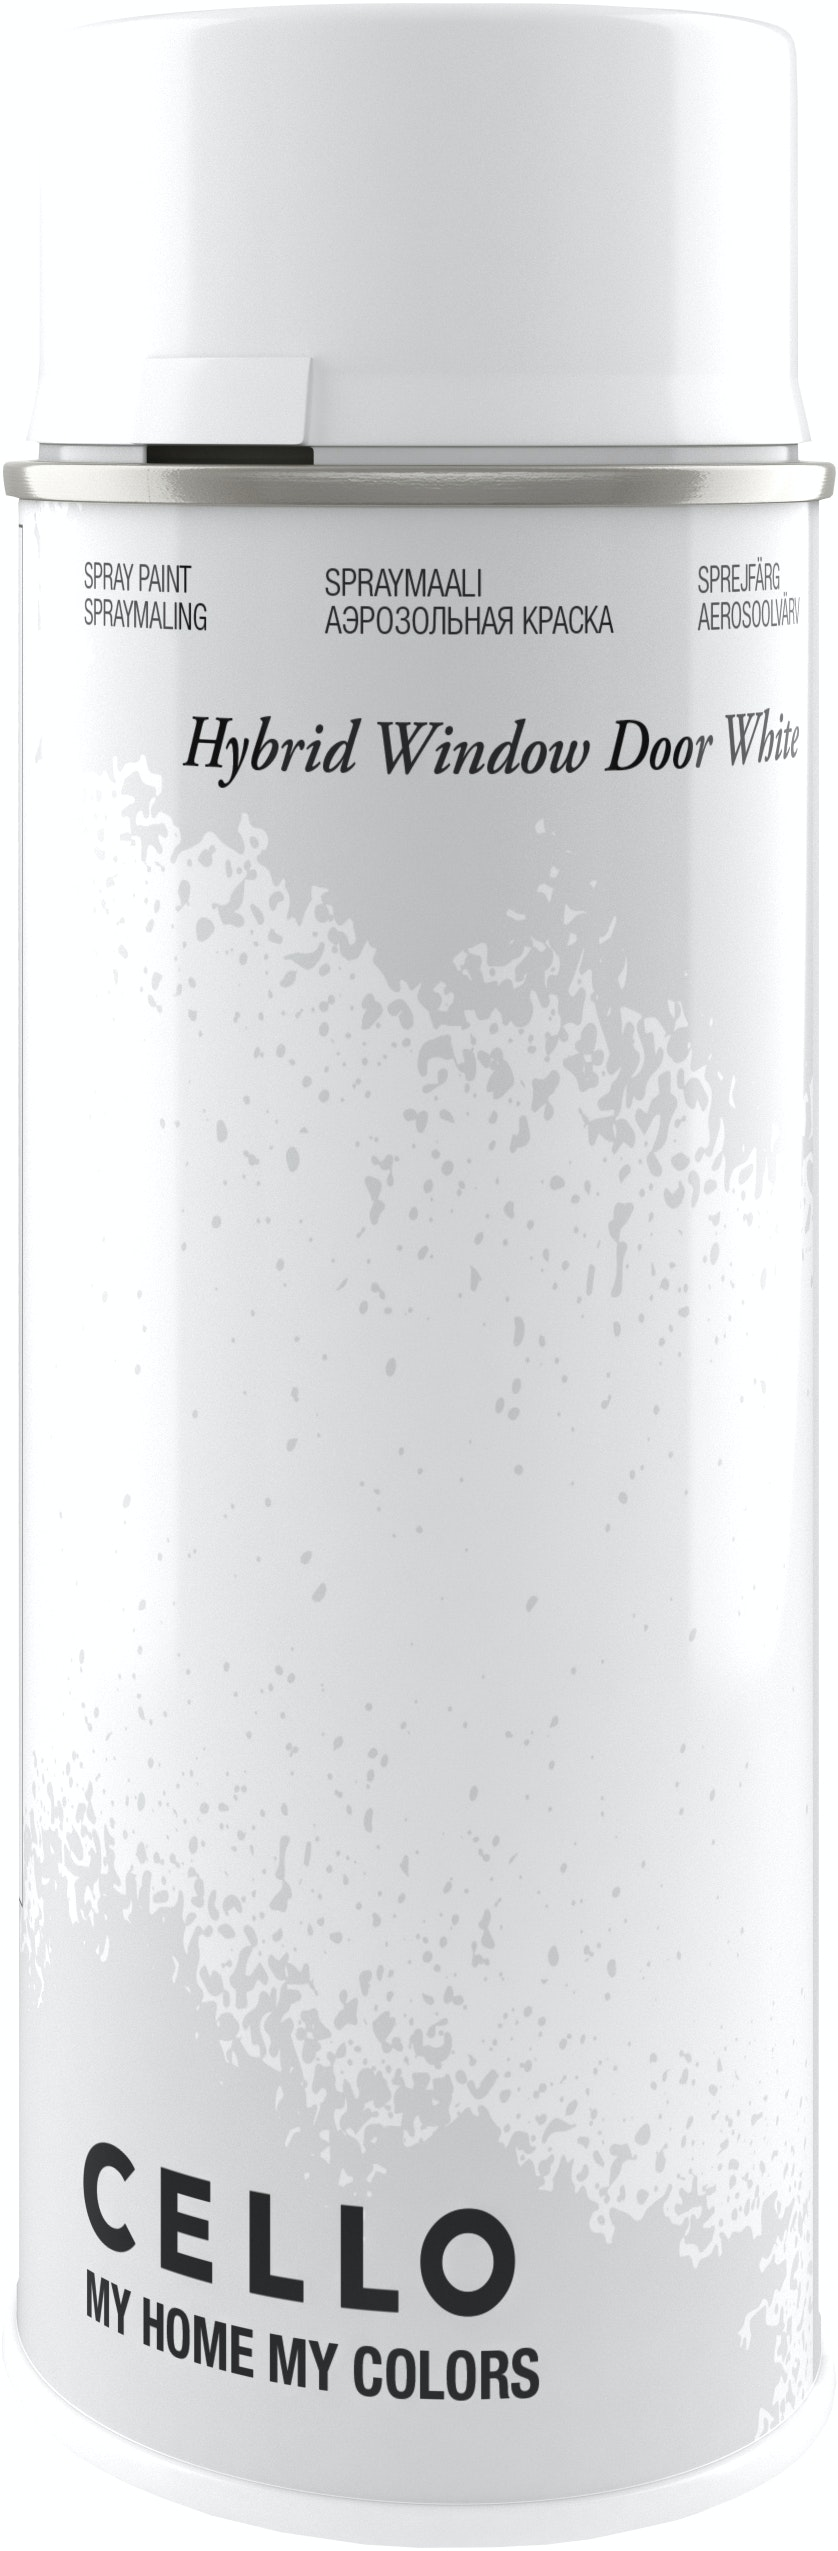 Sprayfärg Cello Hybrid Sidenmatt Vit 400ml